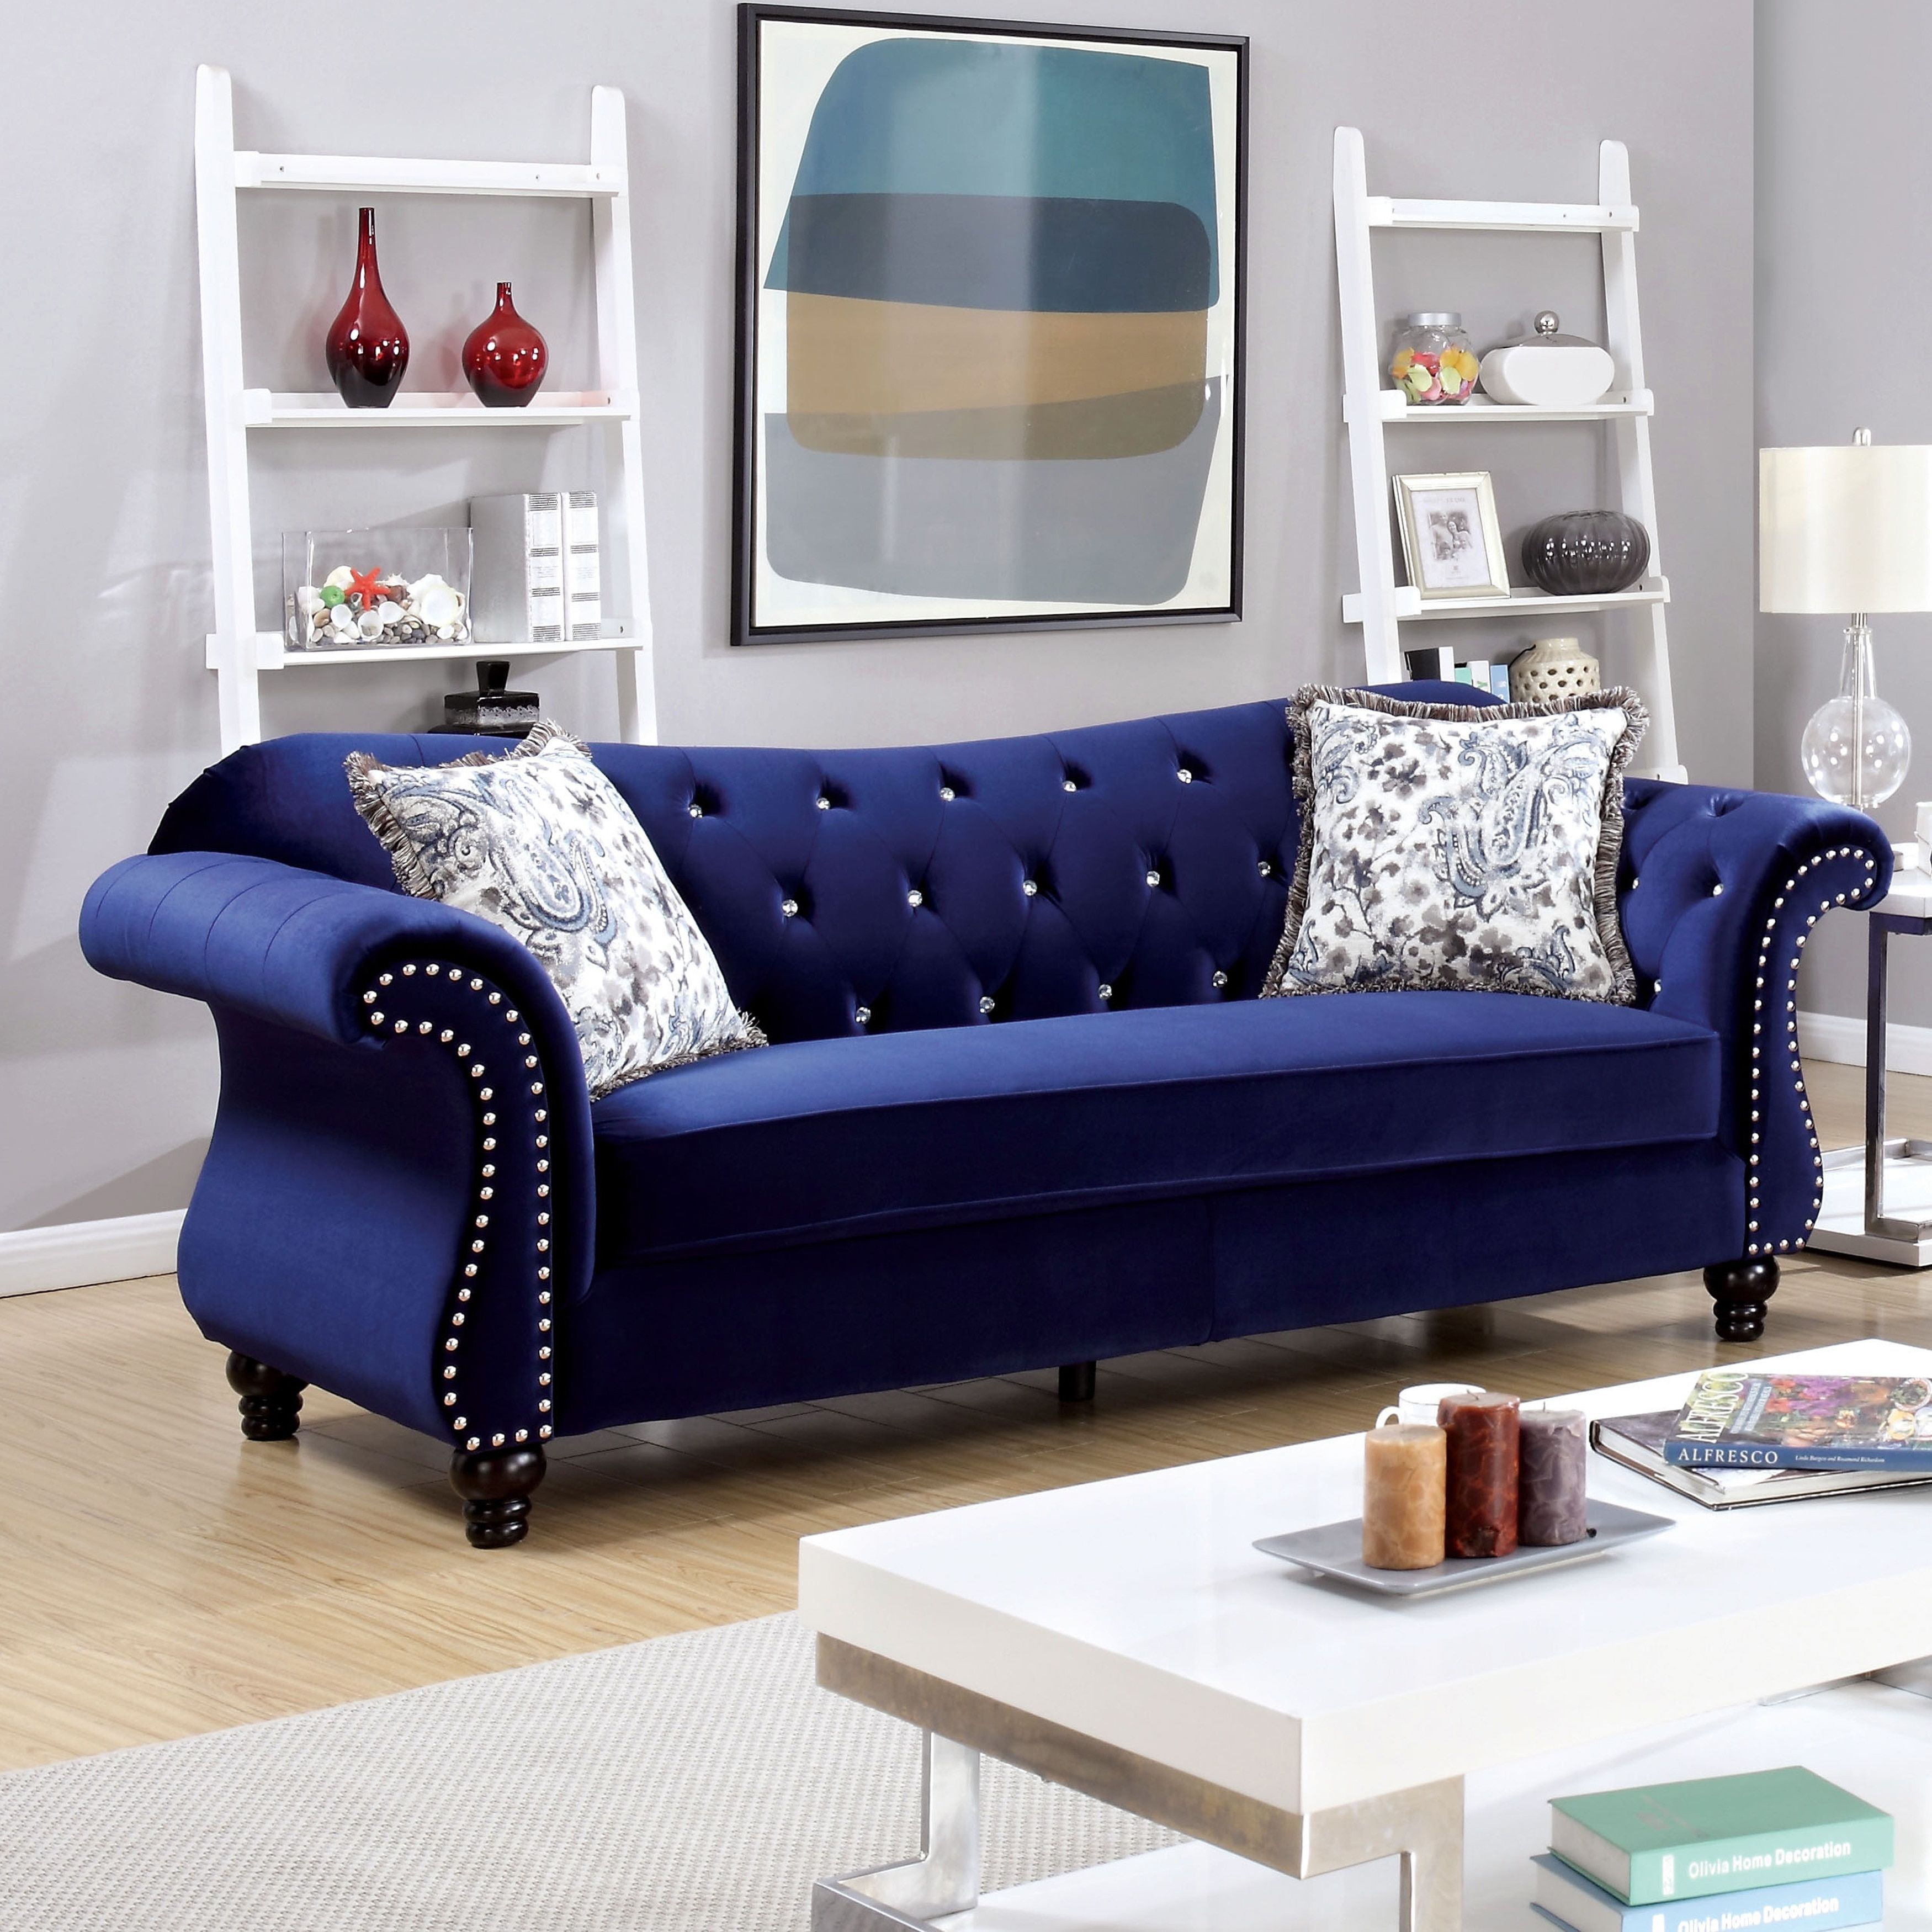 Outstanding Furniture Of America Dessie Traditional 2 Piece Tufted Sofa Creativecarmelina Interior Chair Design Creativecarmelinacom